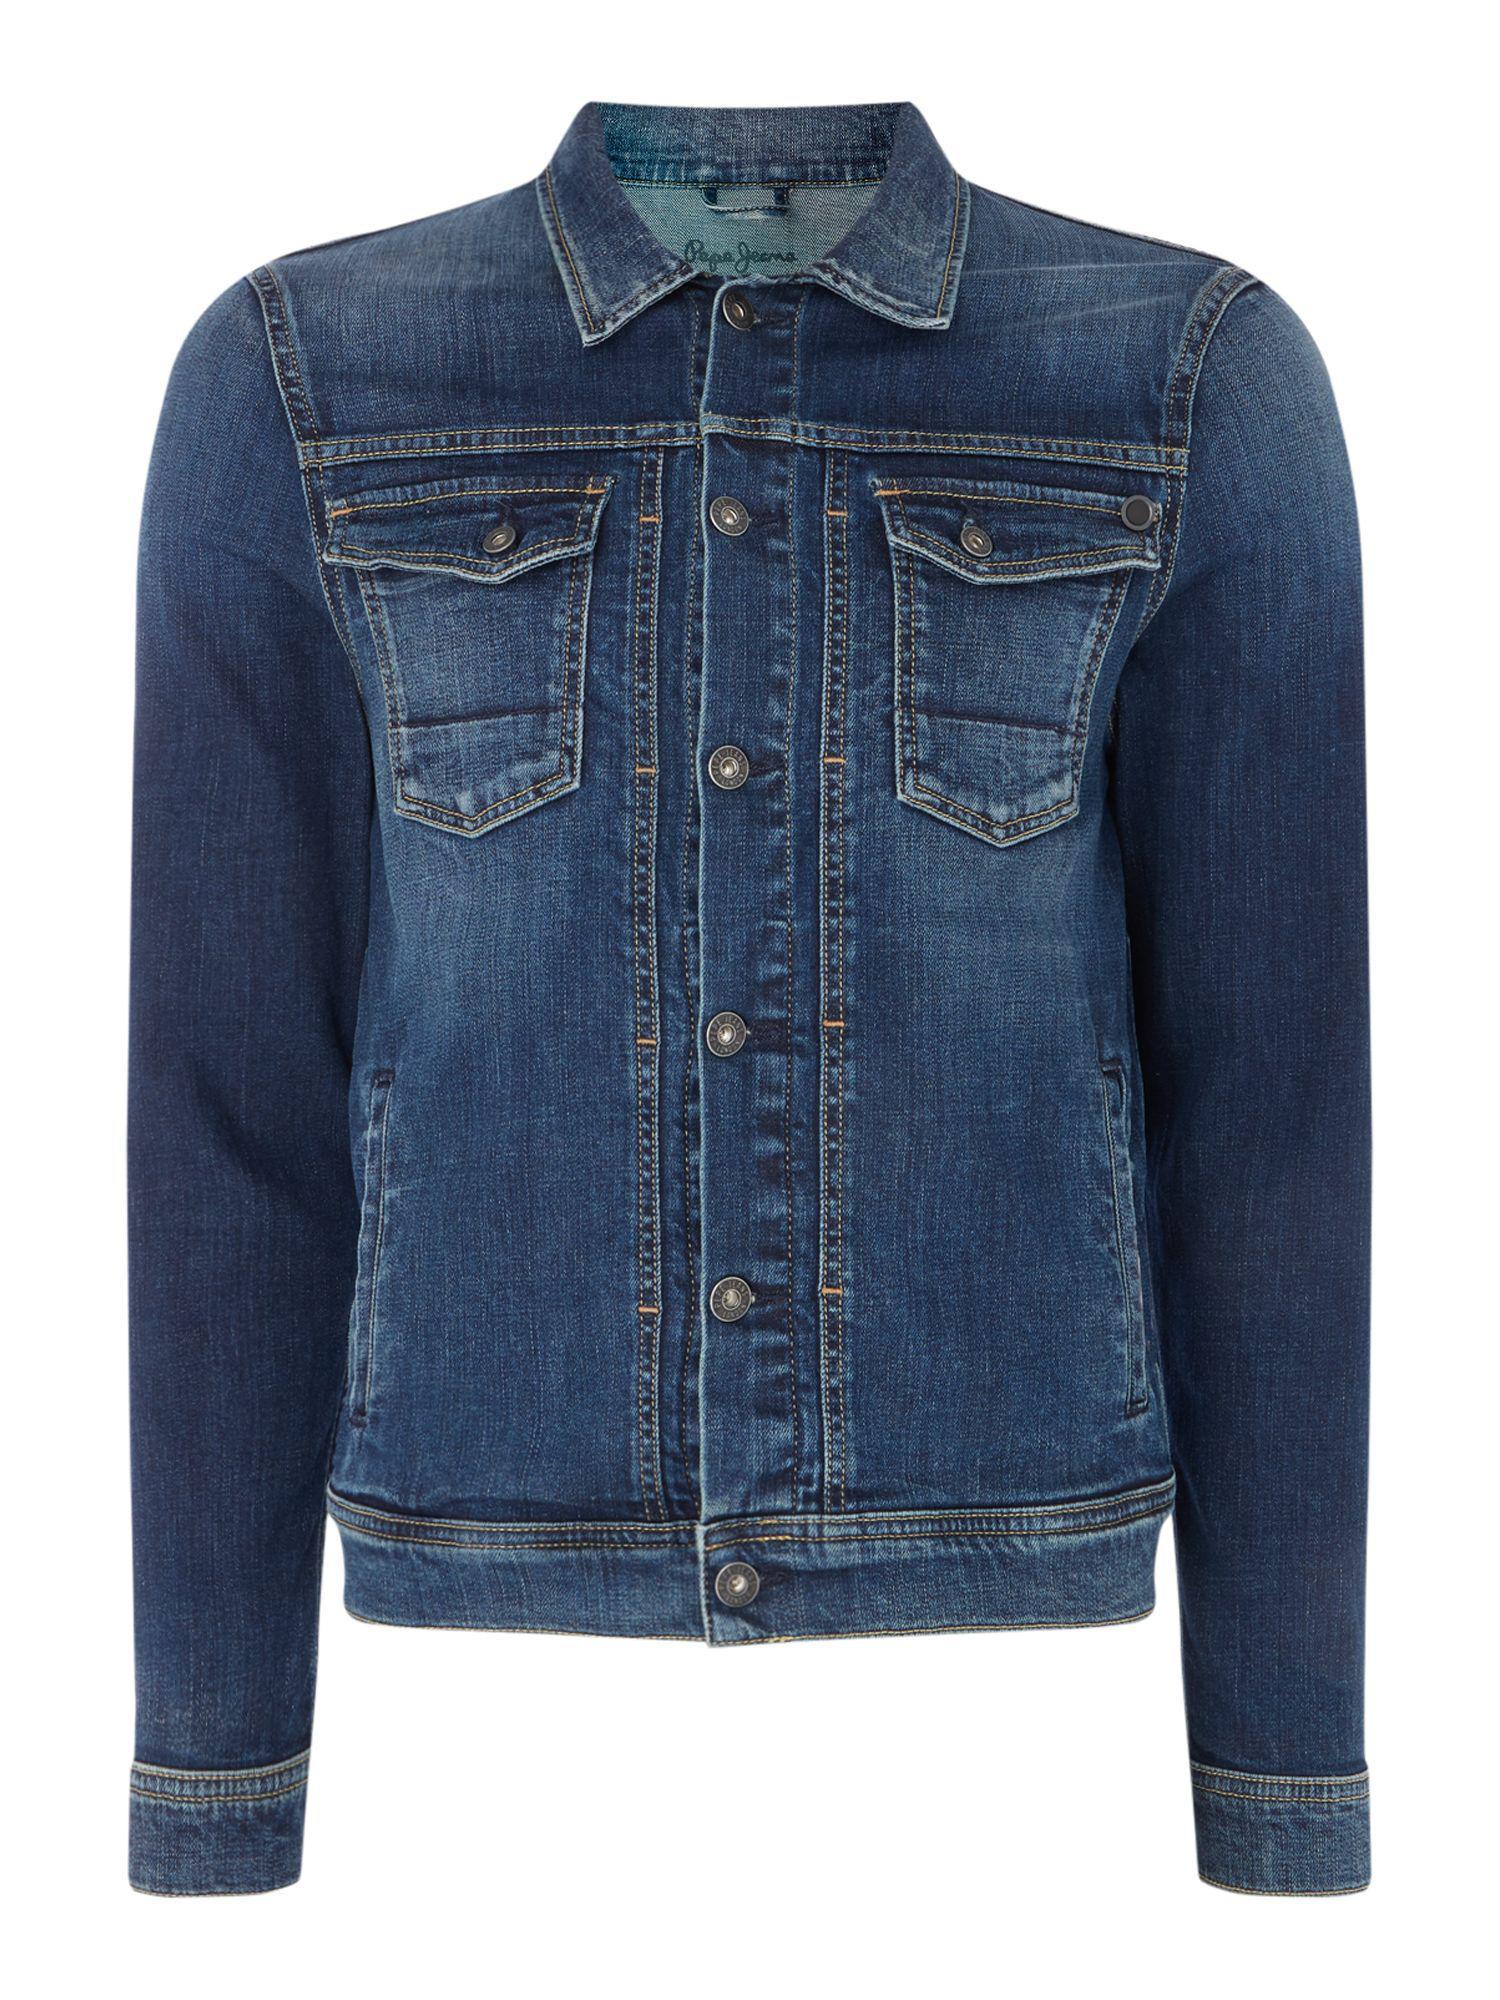 Pepe jeans jacke connor